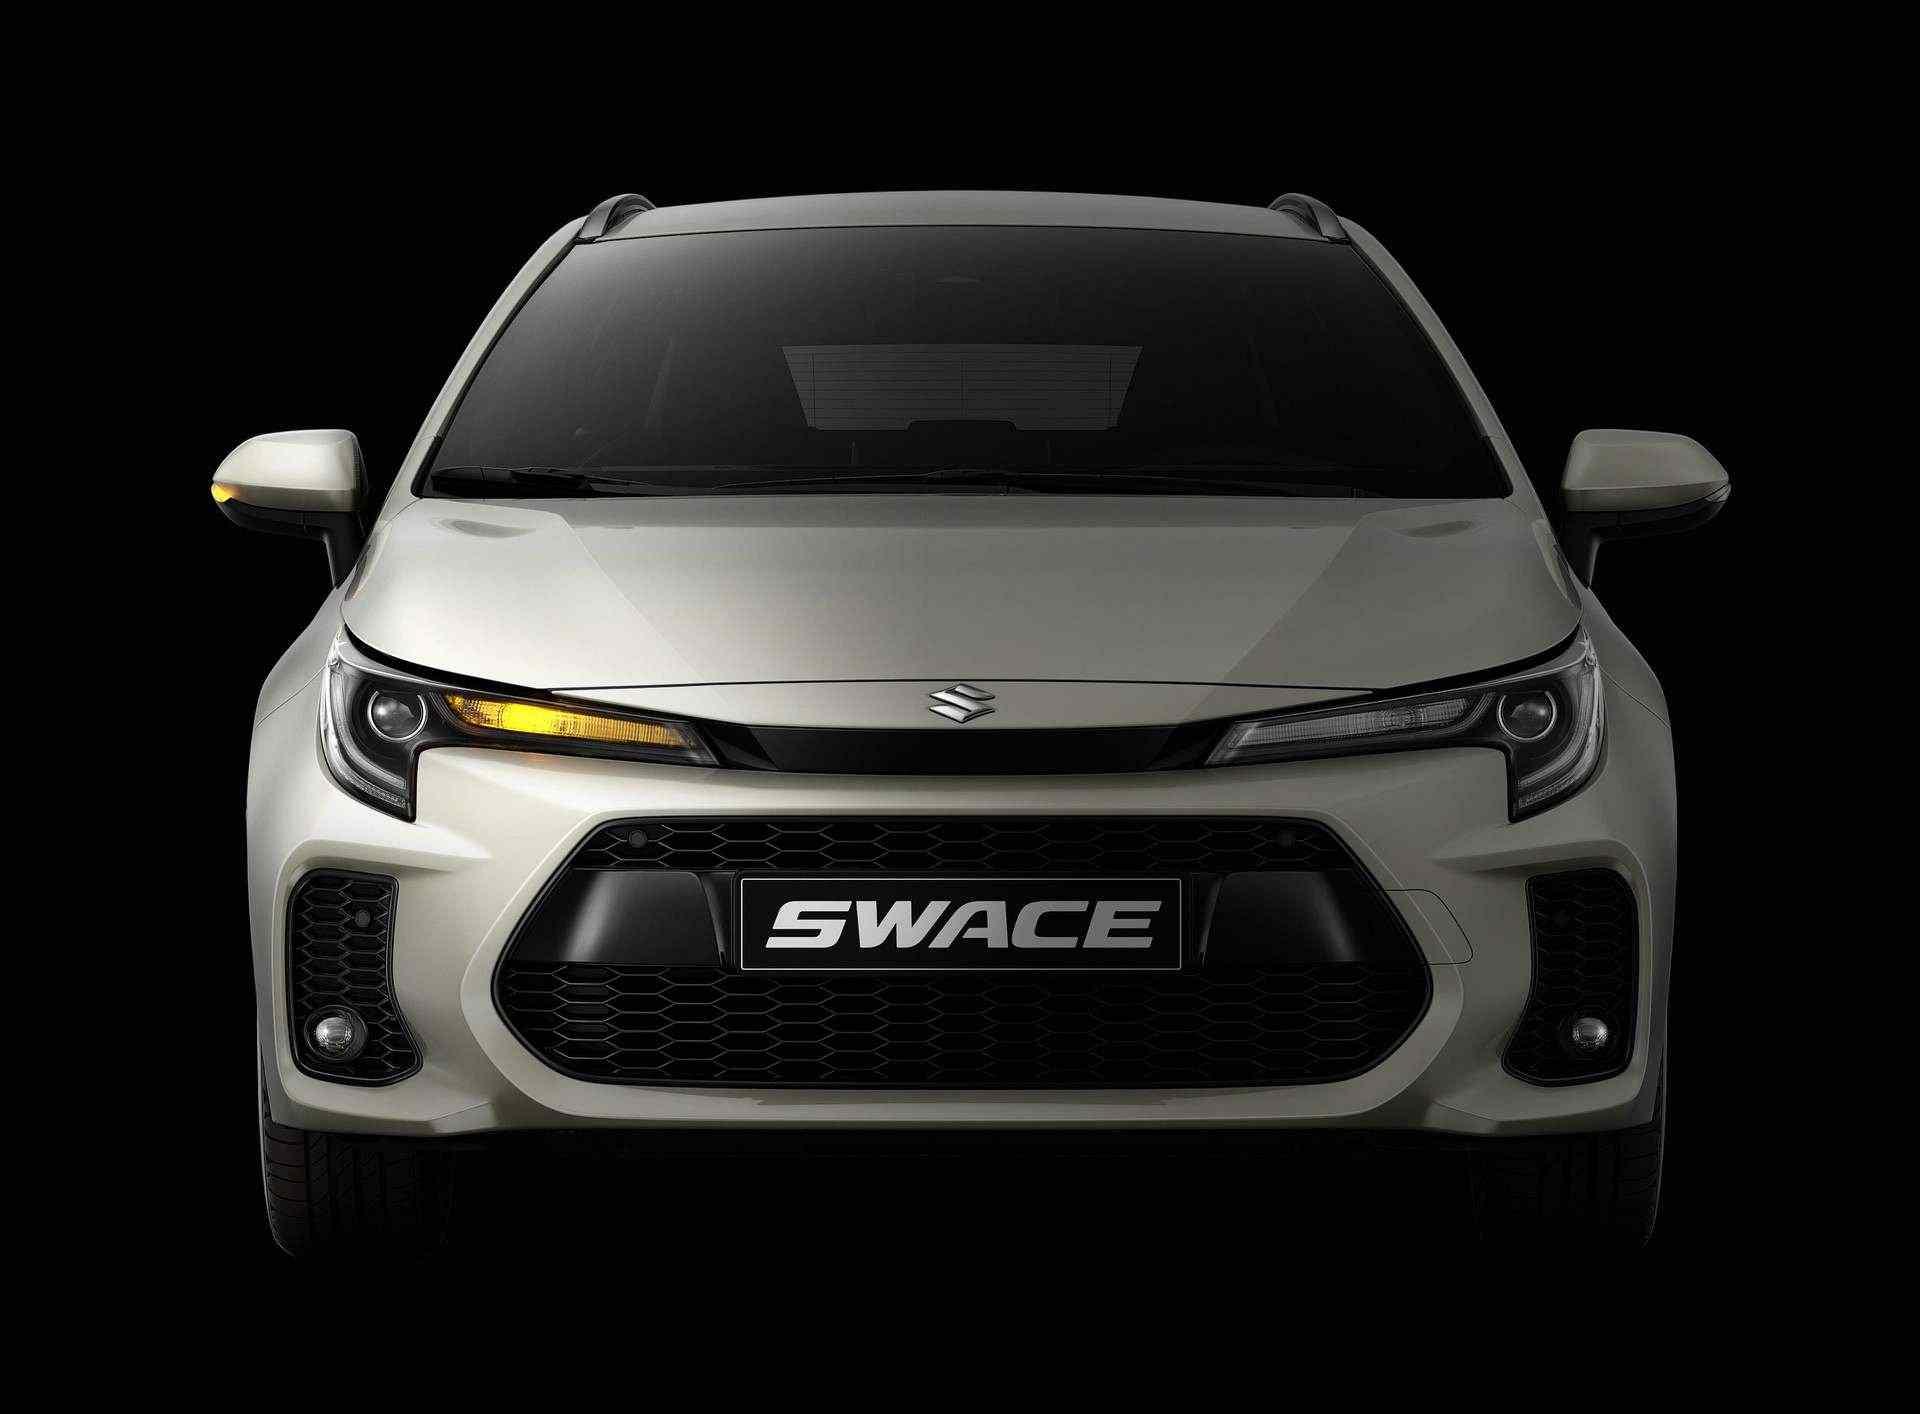 Suzuki_Swace_Greek-0006